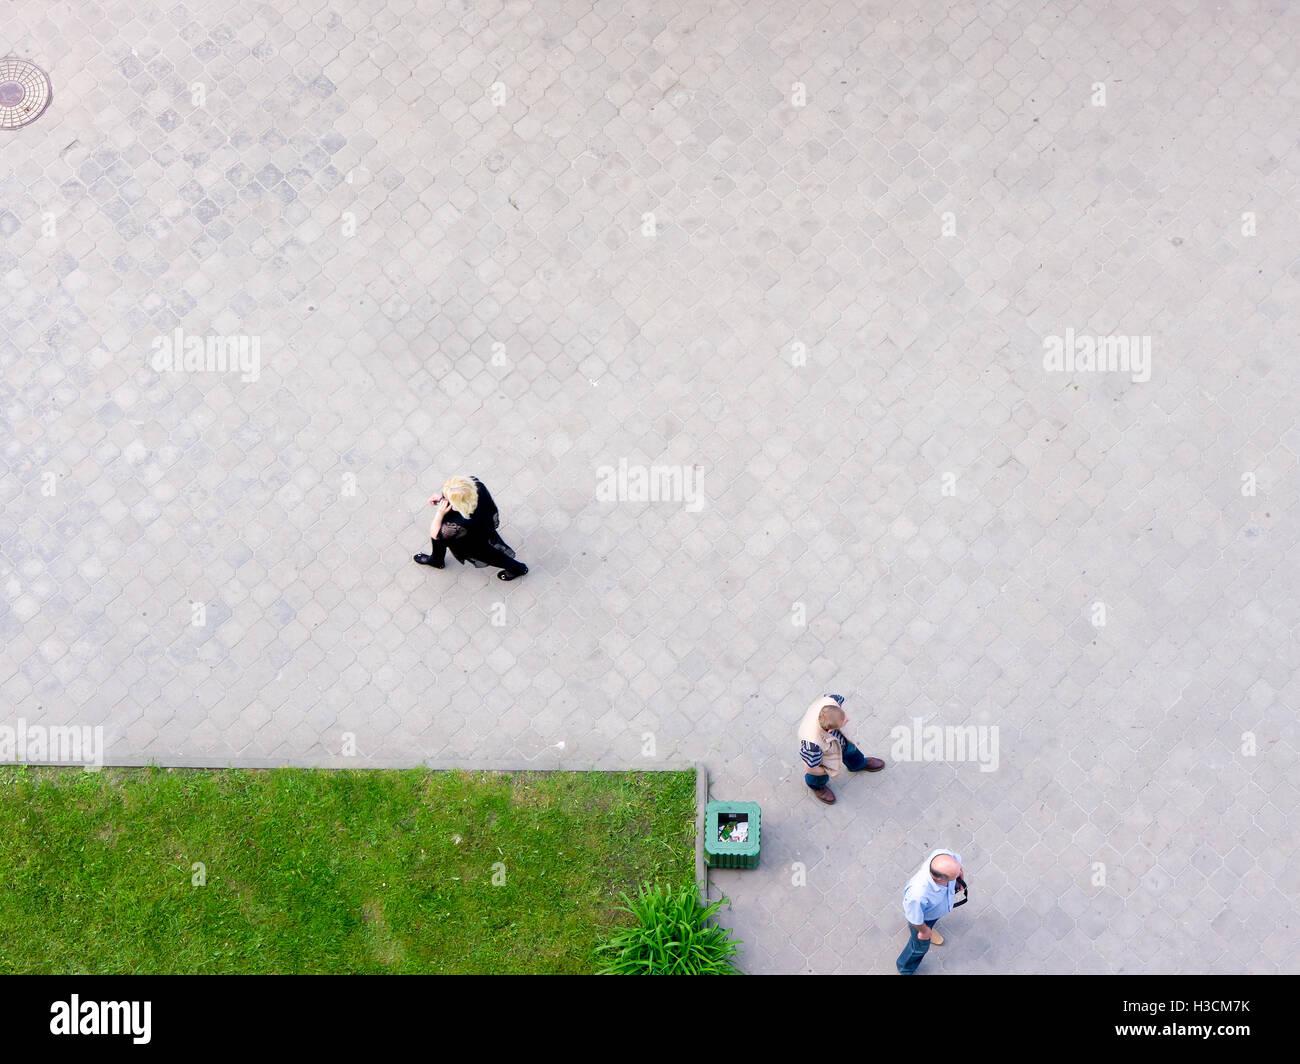 GOMEL, BELARUS - MAY 26: A man walking down the street on May 26, 2016 in Gomel, Belarus. - Stock Image